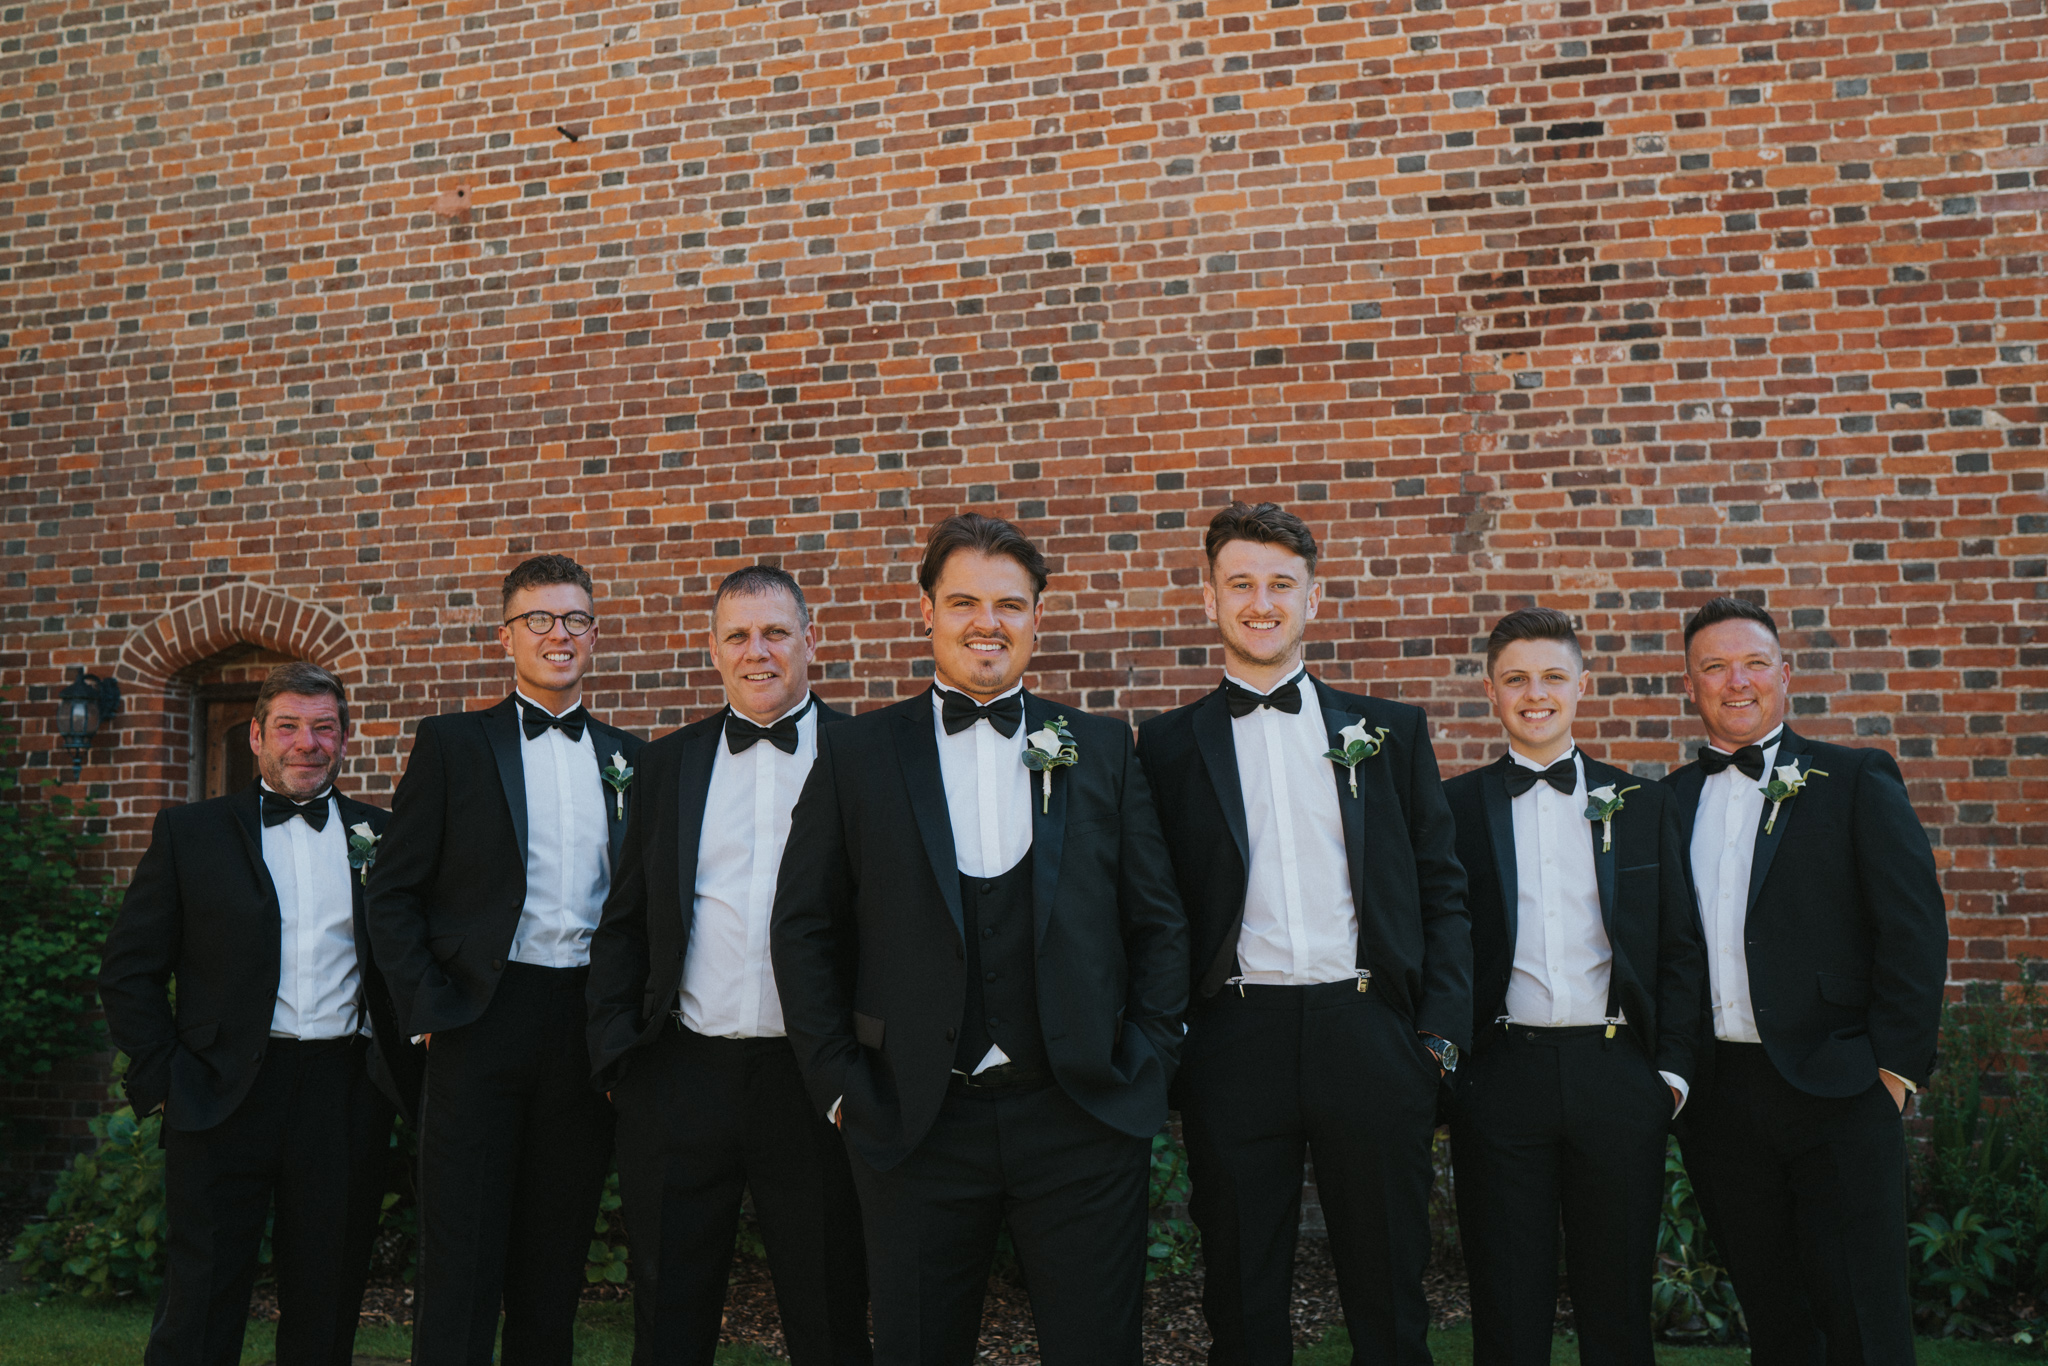 chloe-dan-gosfield-hall-wedding-photographer-grace-elizabeth-colchester-essex-alternative-wedding-photographer-suffolk-norfolk-devon (26 of 41).jpg